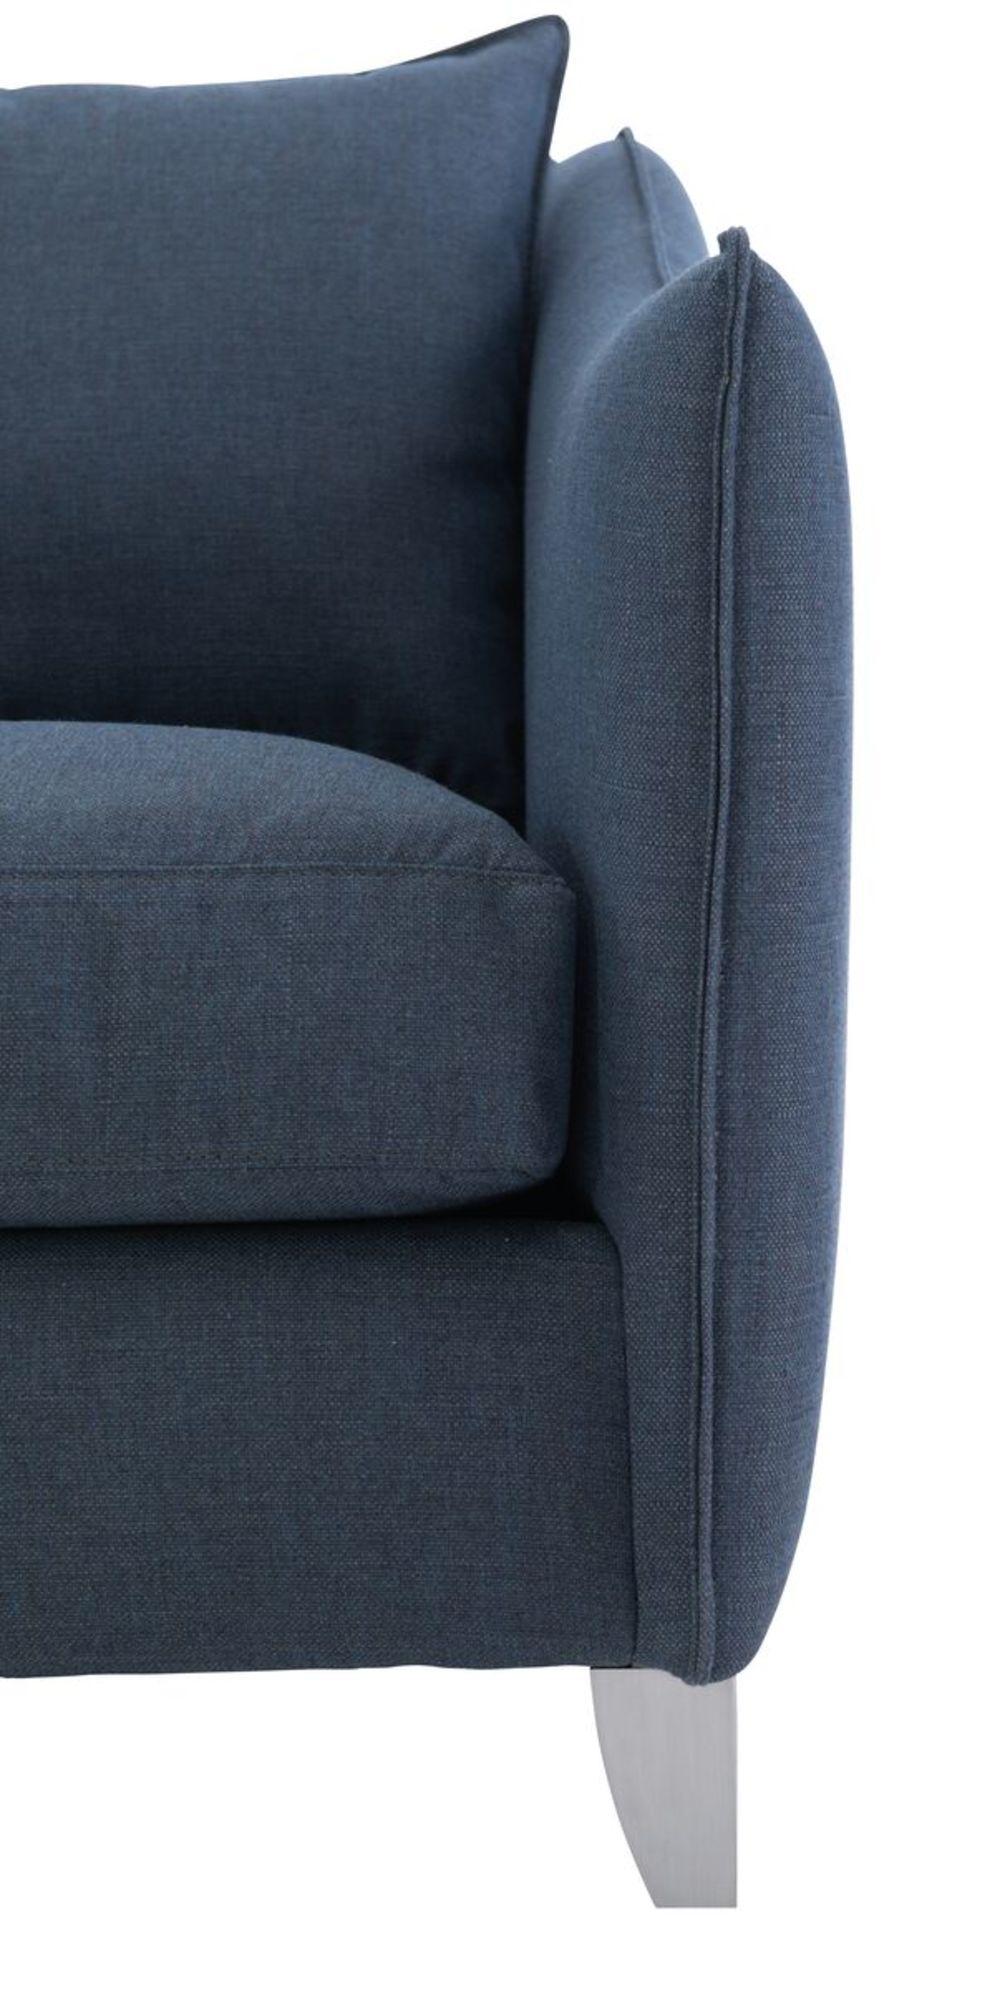 Bernhardt - Monterey Right Arm Loveseat and Chaise